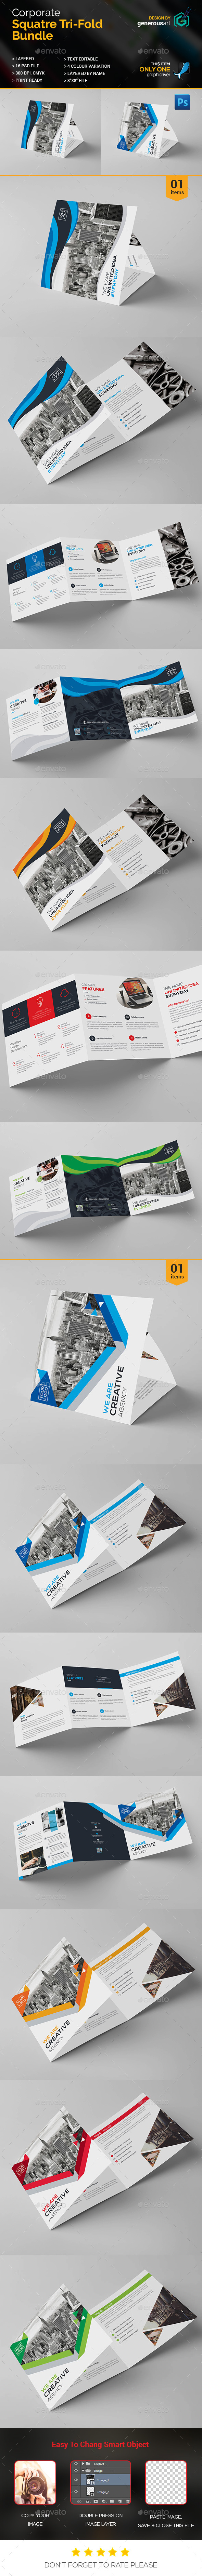 Bundle_Square Tri-Fold Brochure - Corporate Brochures